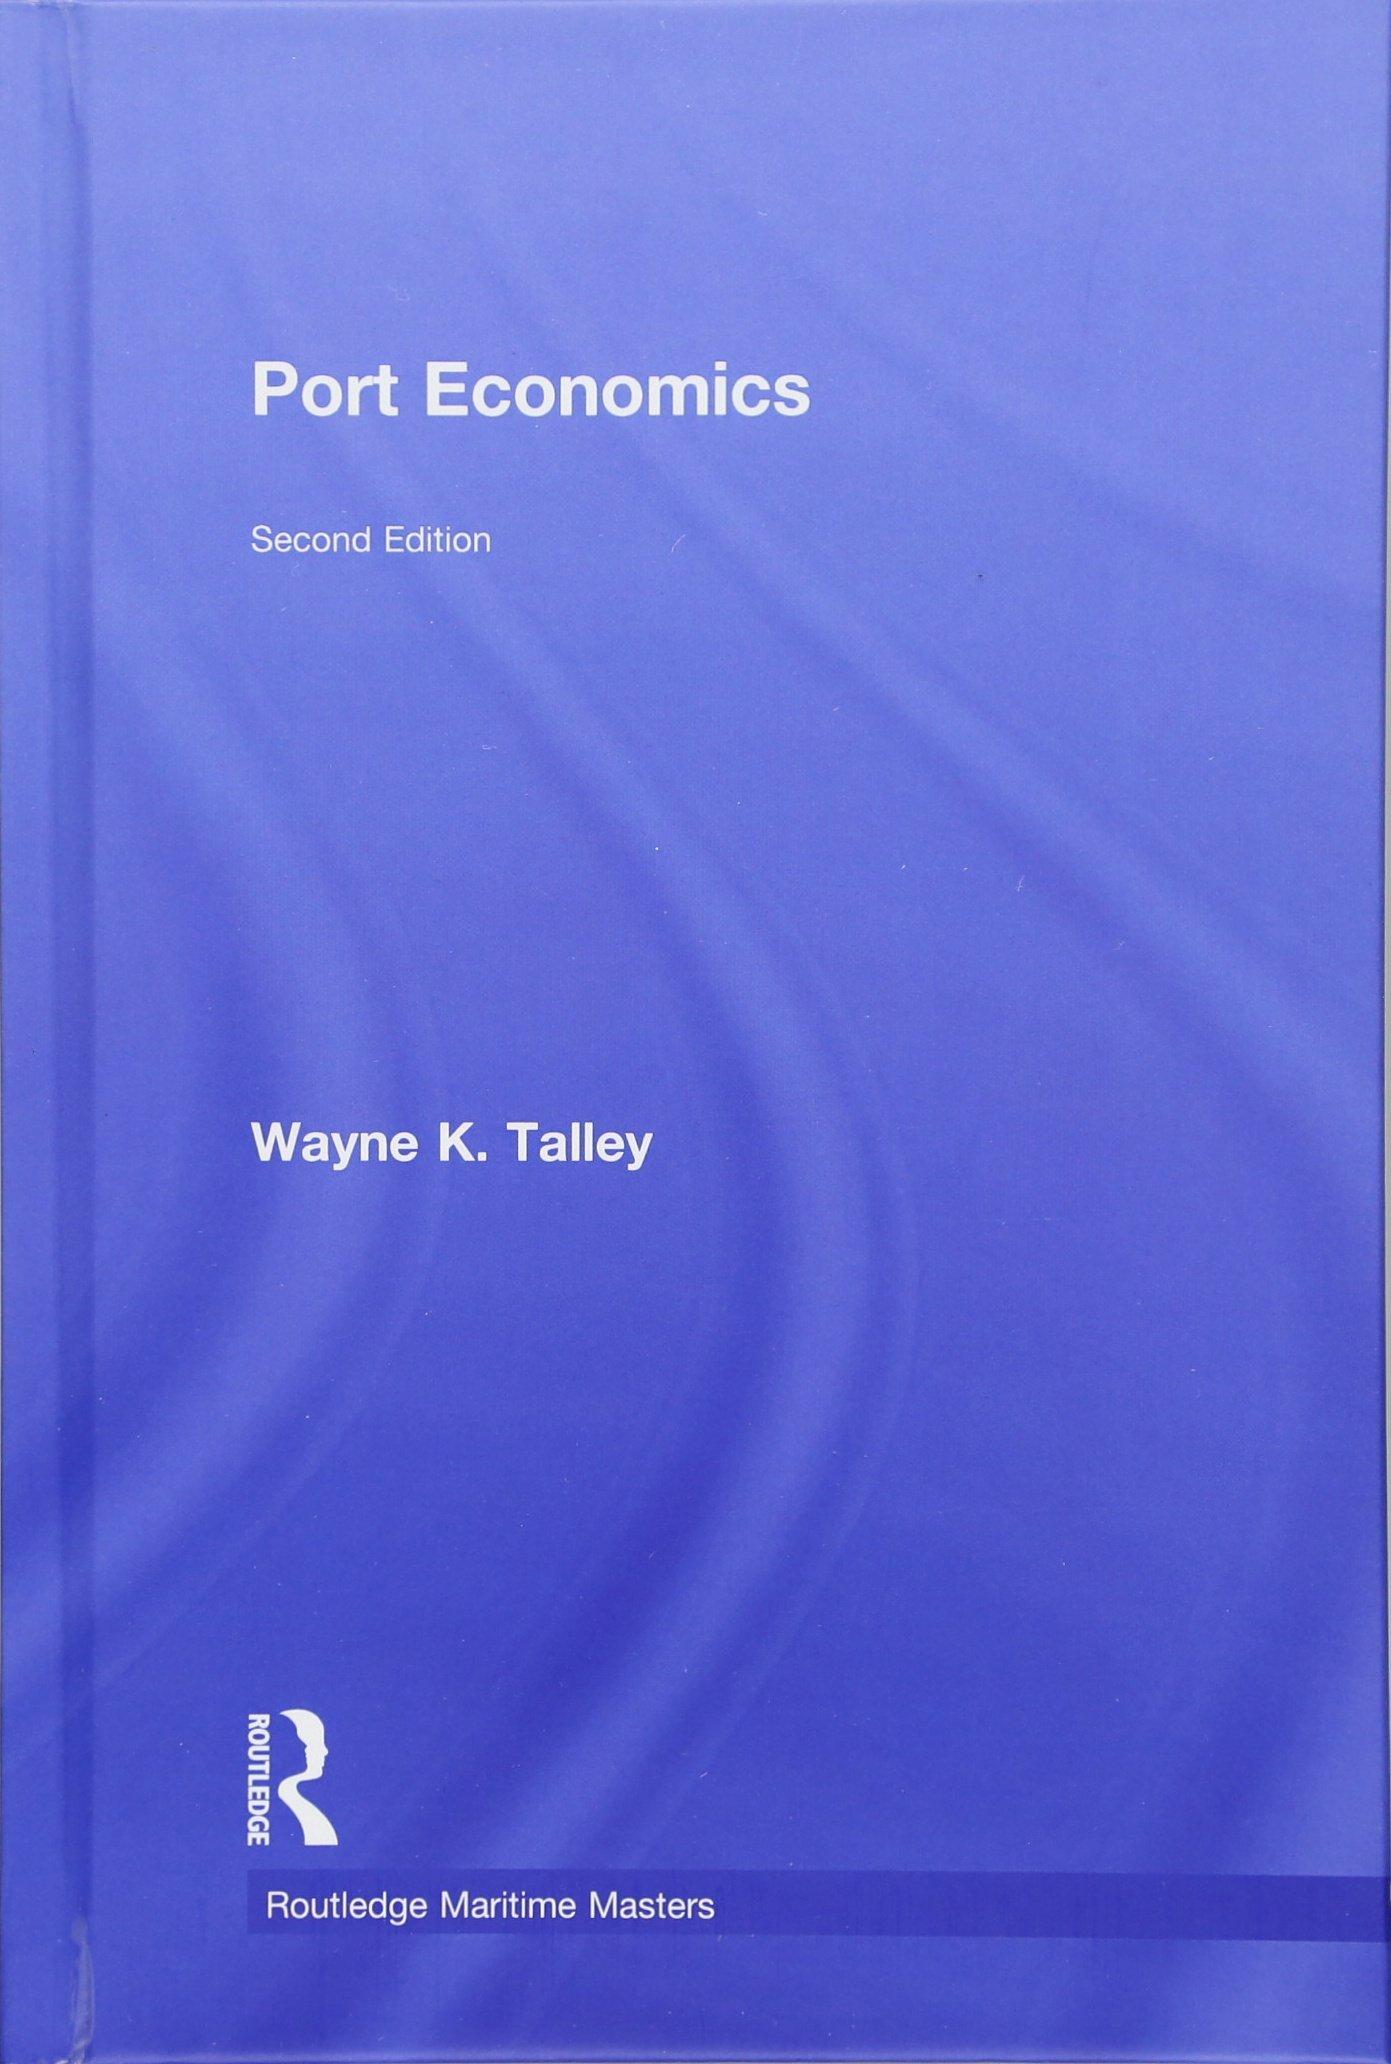 Port Economics (Routledge Maritime Masters)